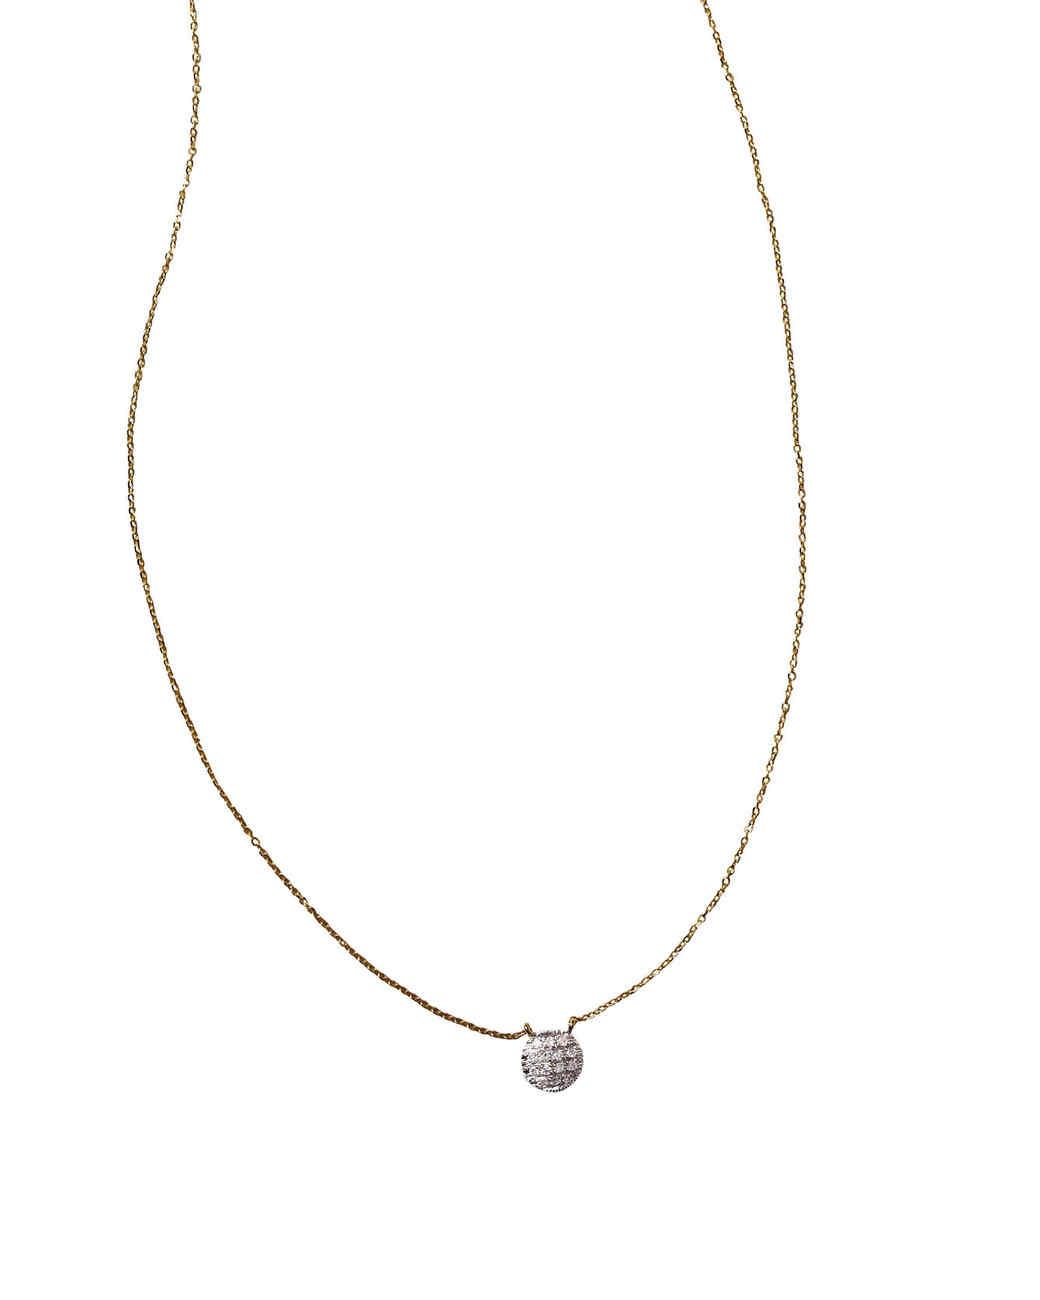 necklace by Dana Rebecca